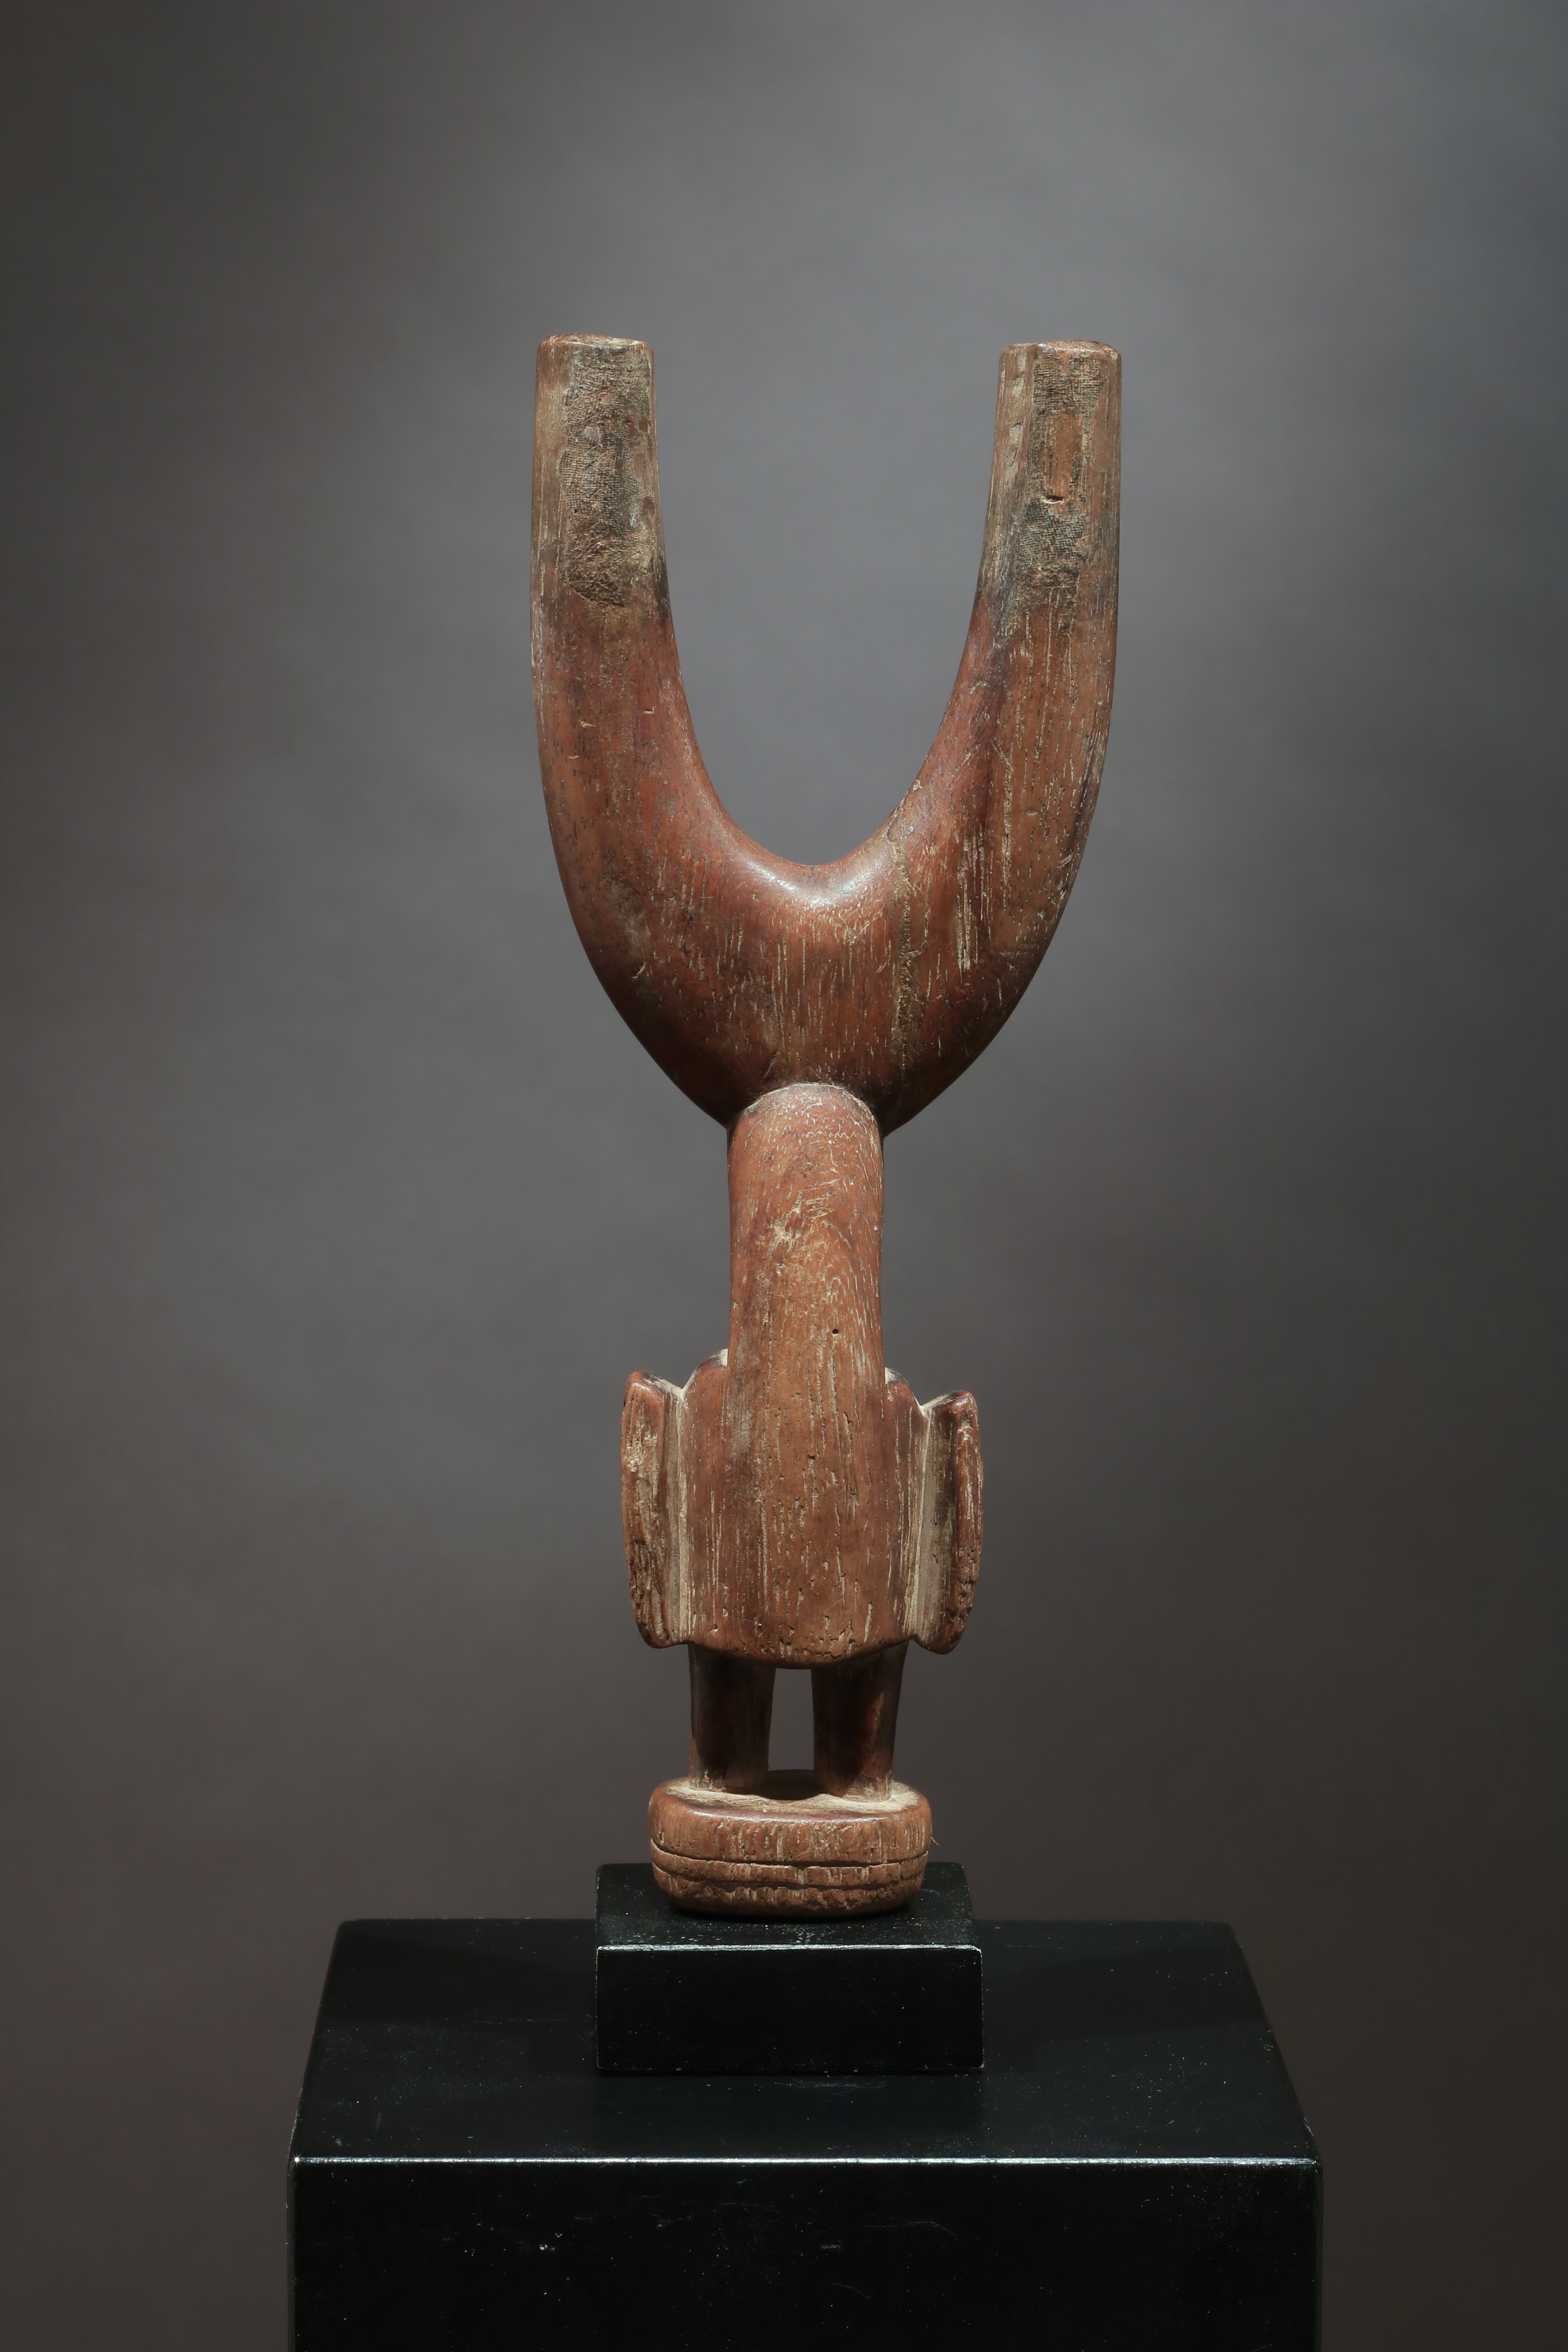 Slingshot / Catapult with Calao bird